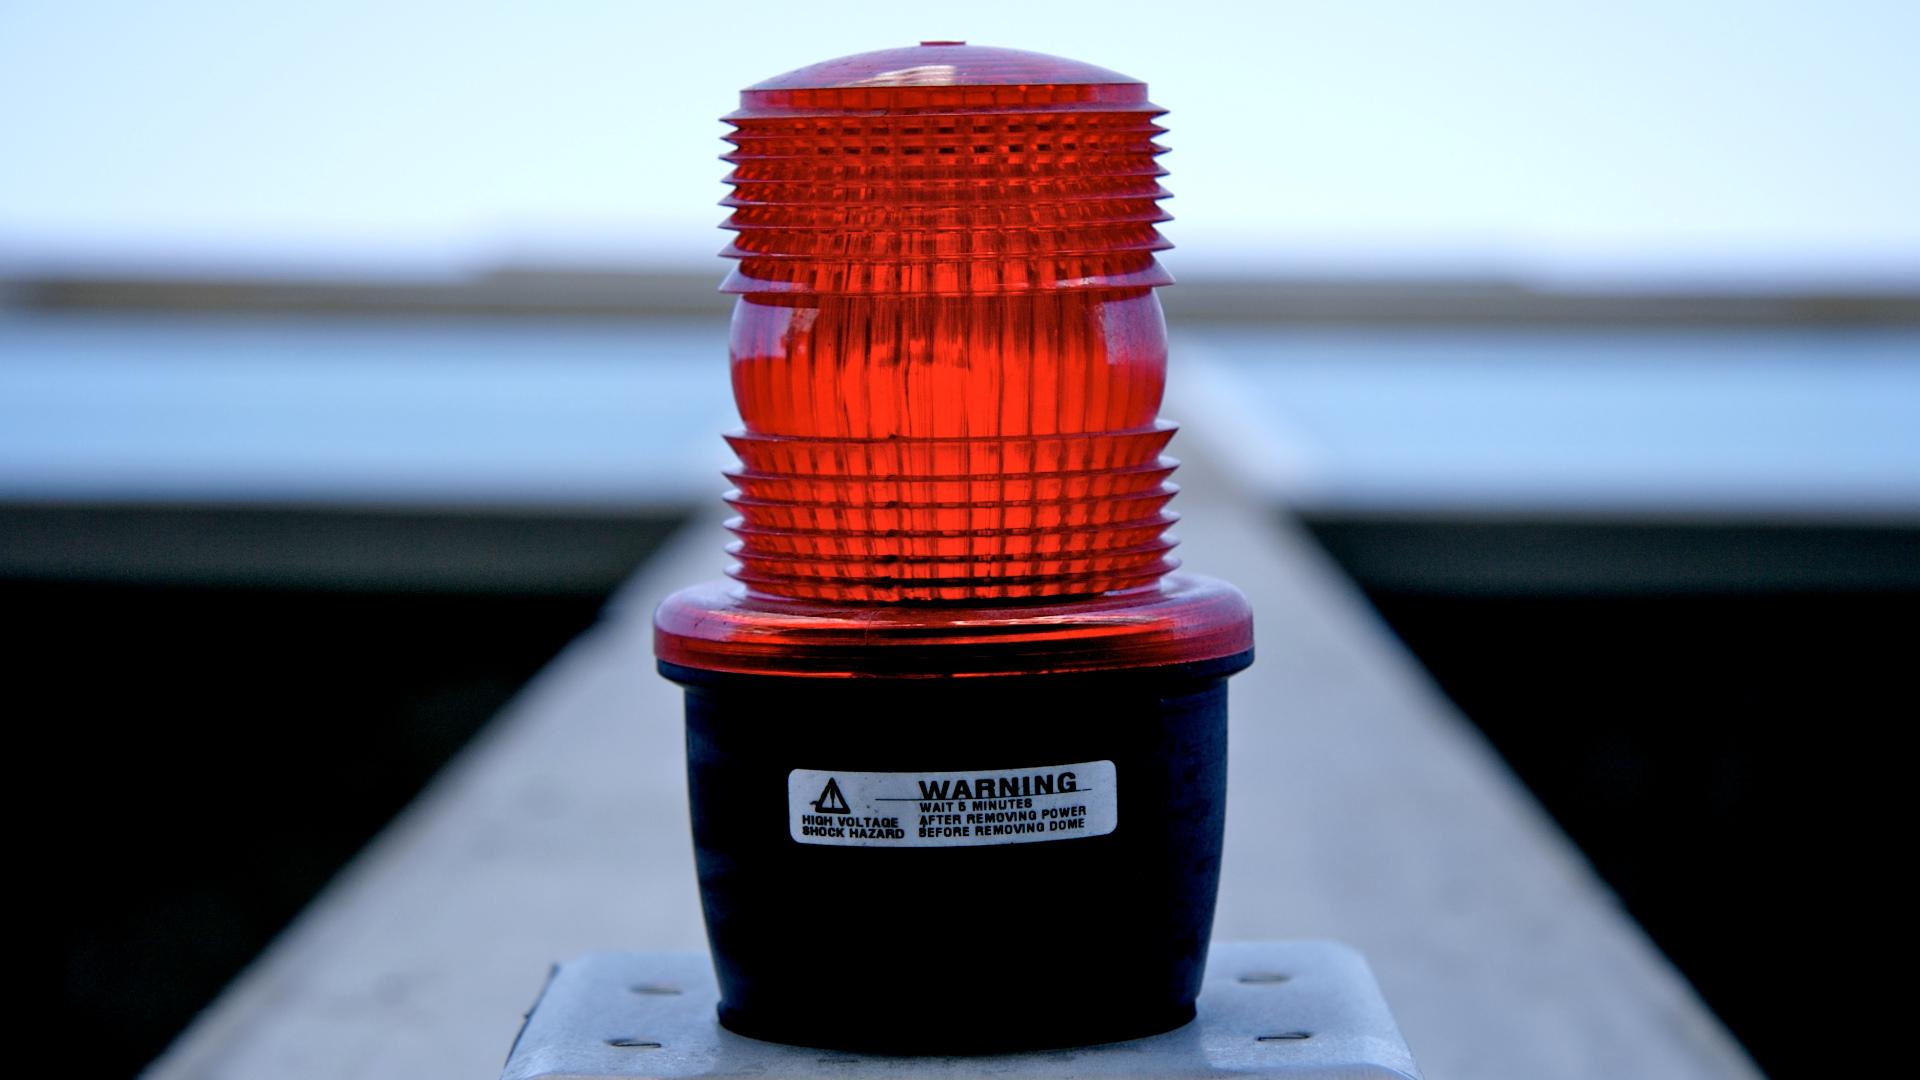 red alert siren